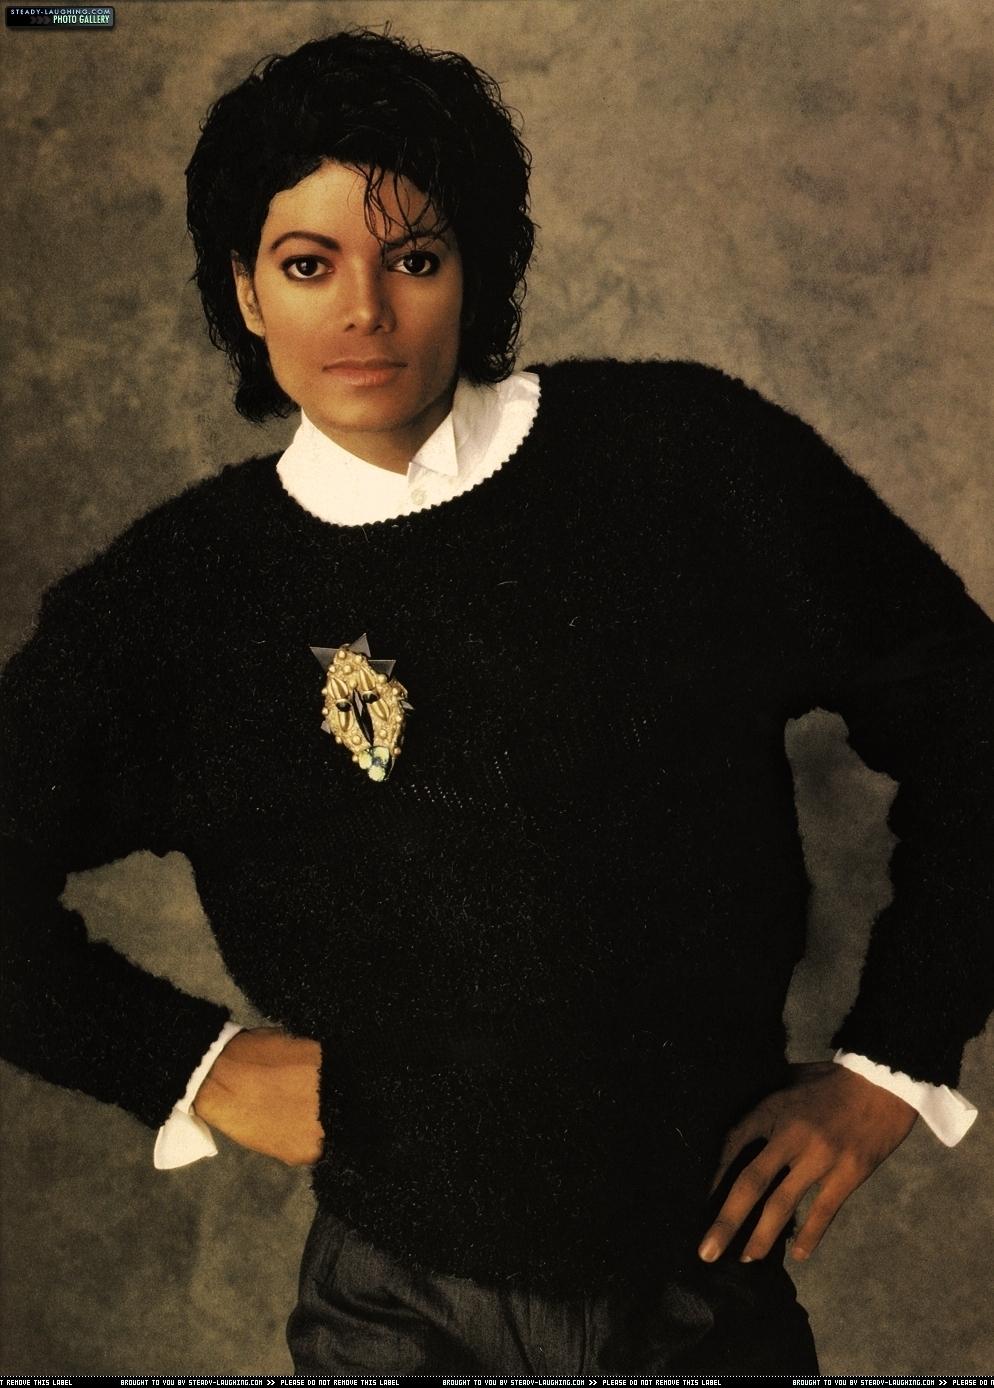 king of pop